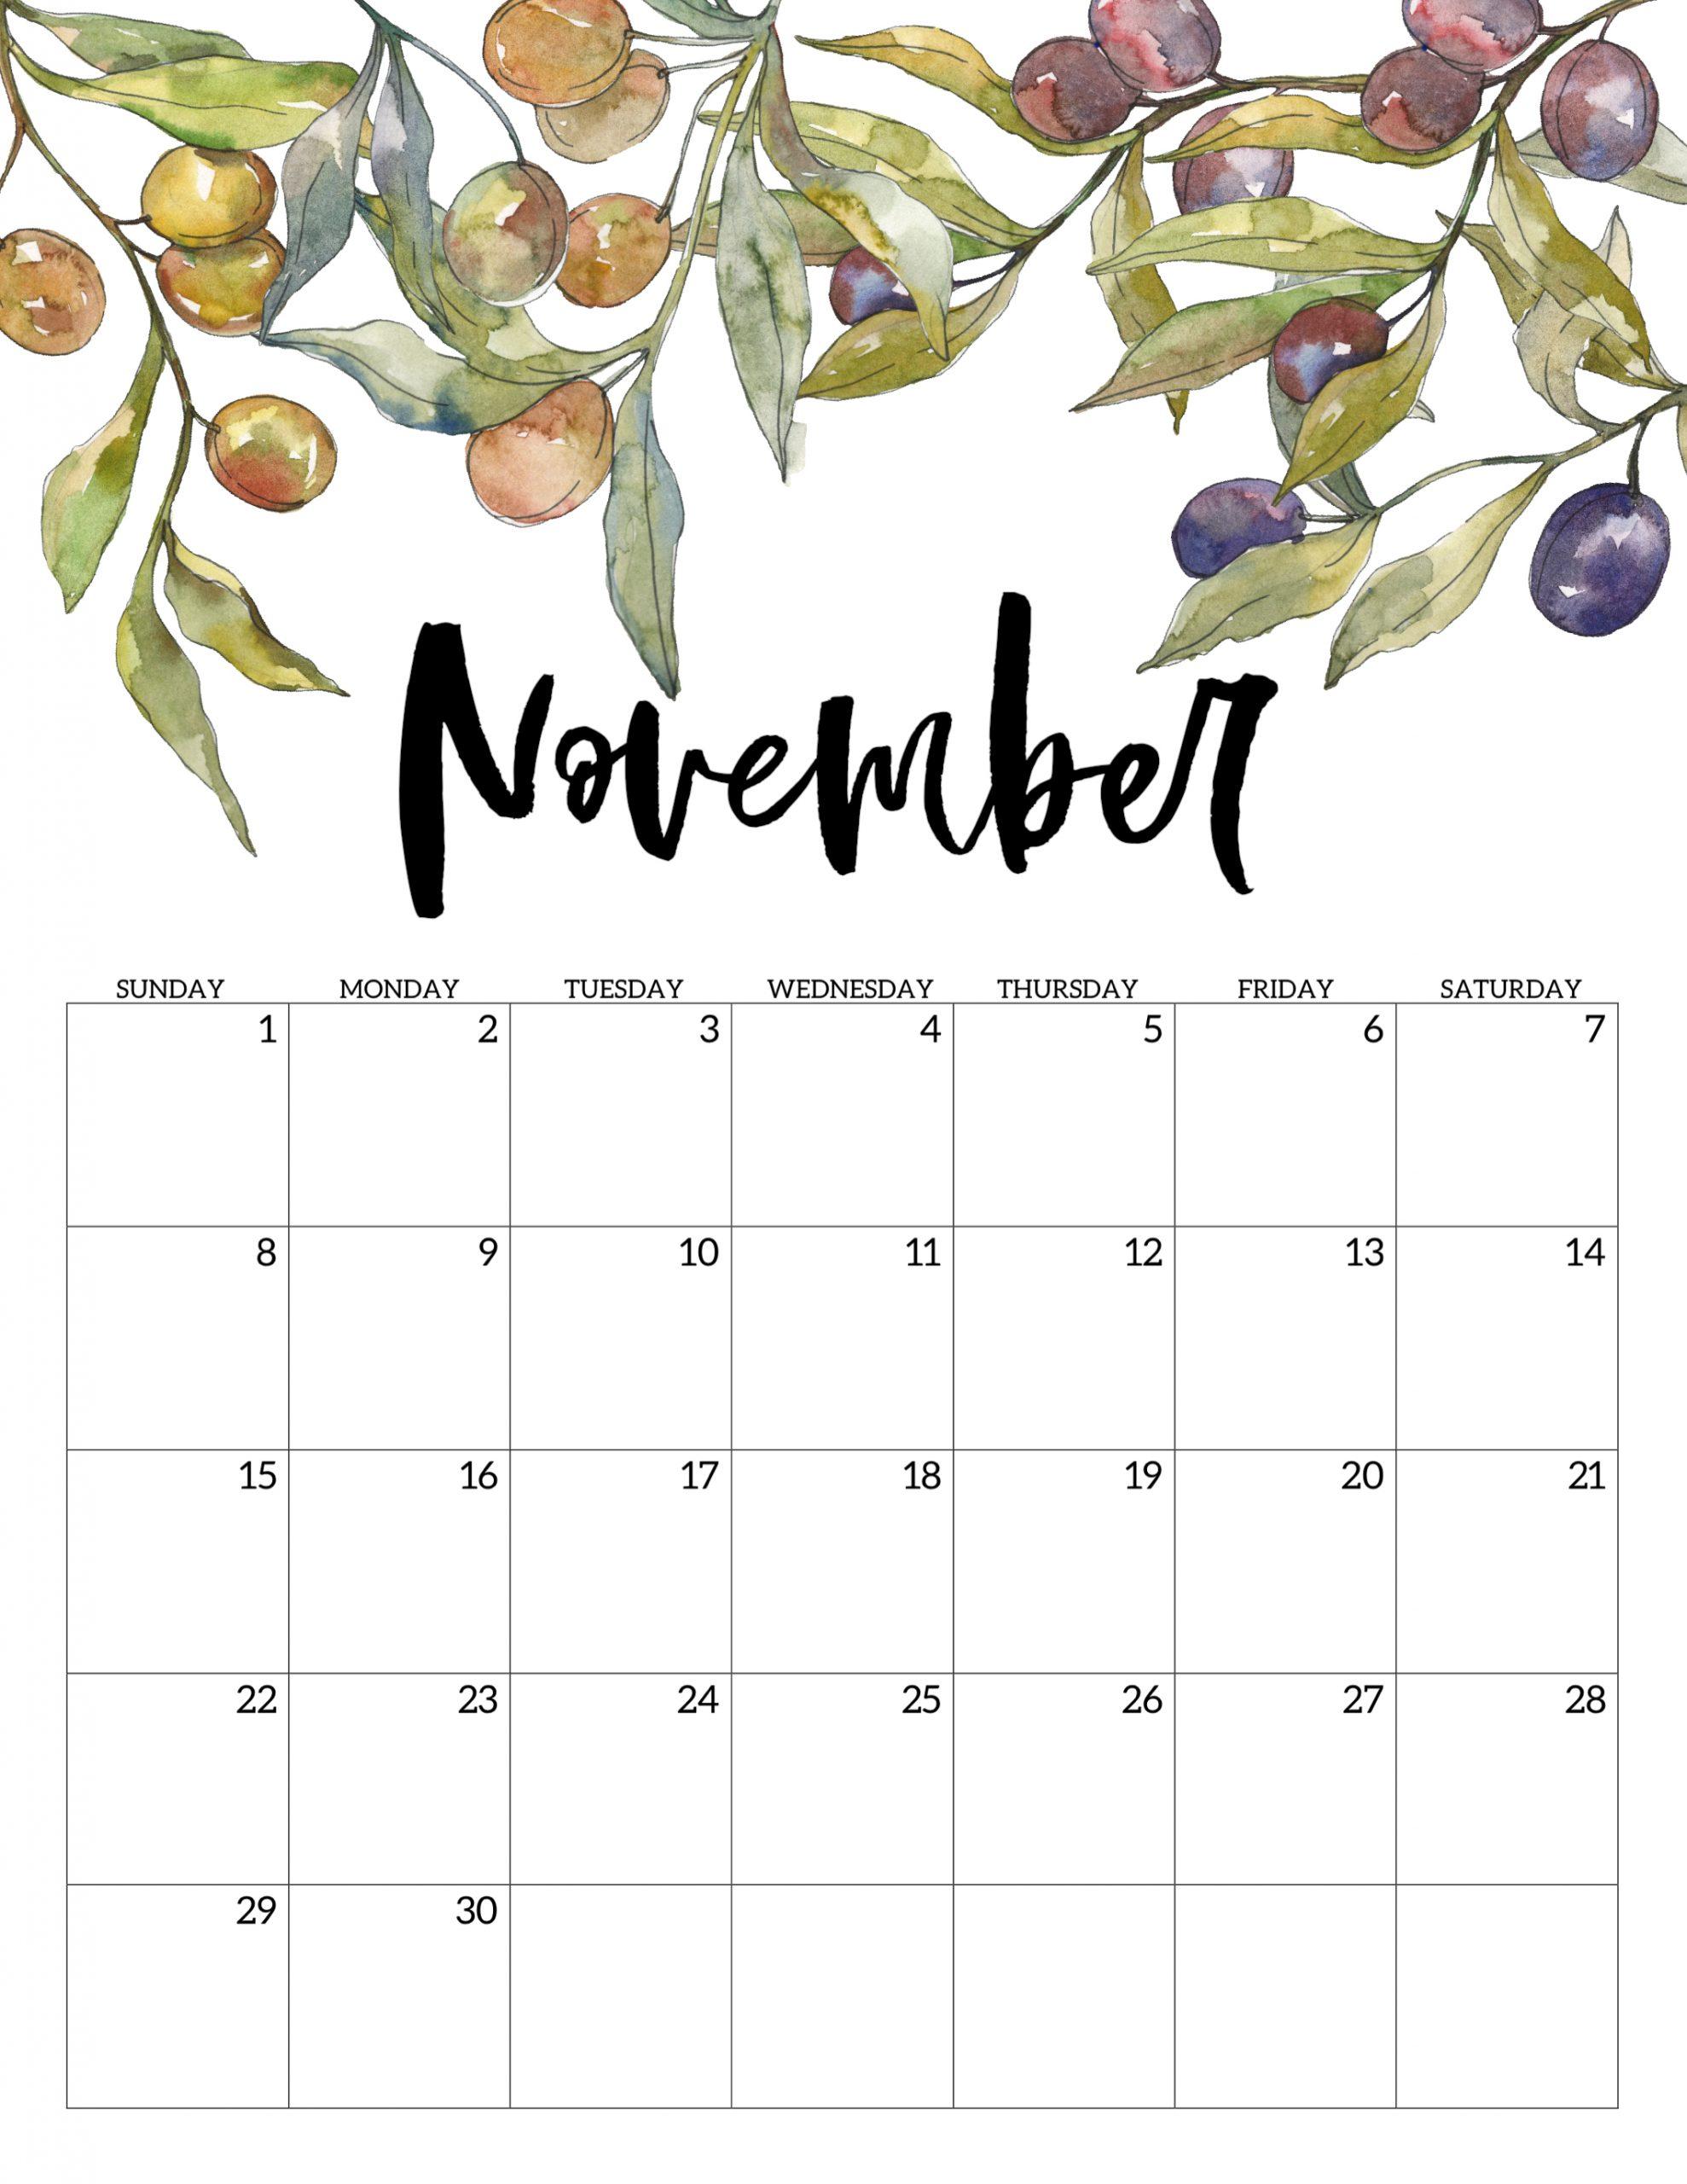 November 2020 Calendars To Print - Togo.wpart.co